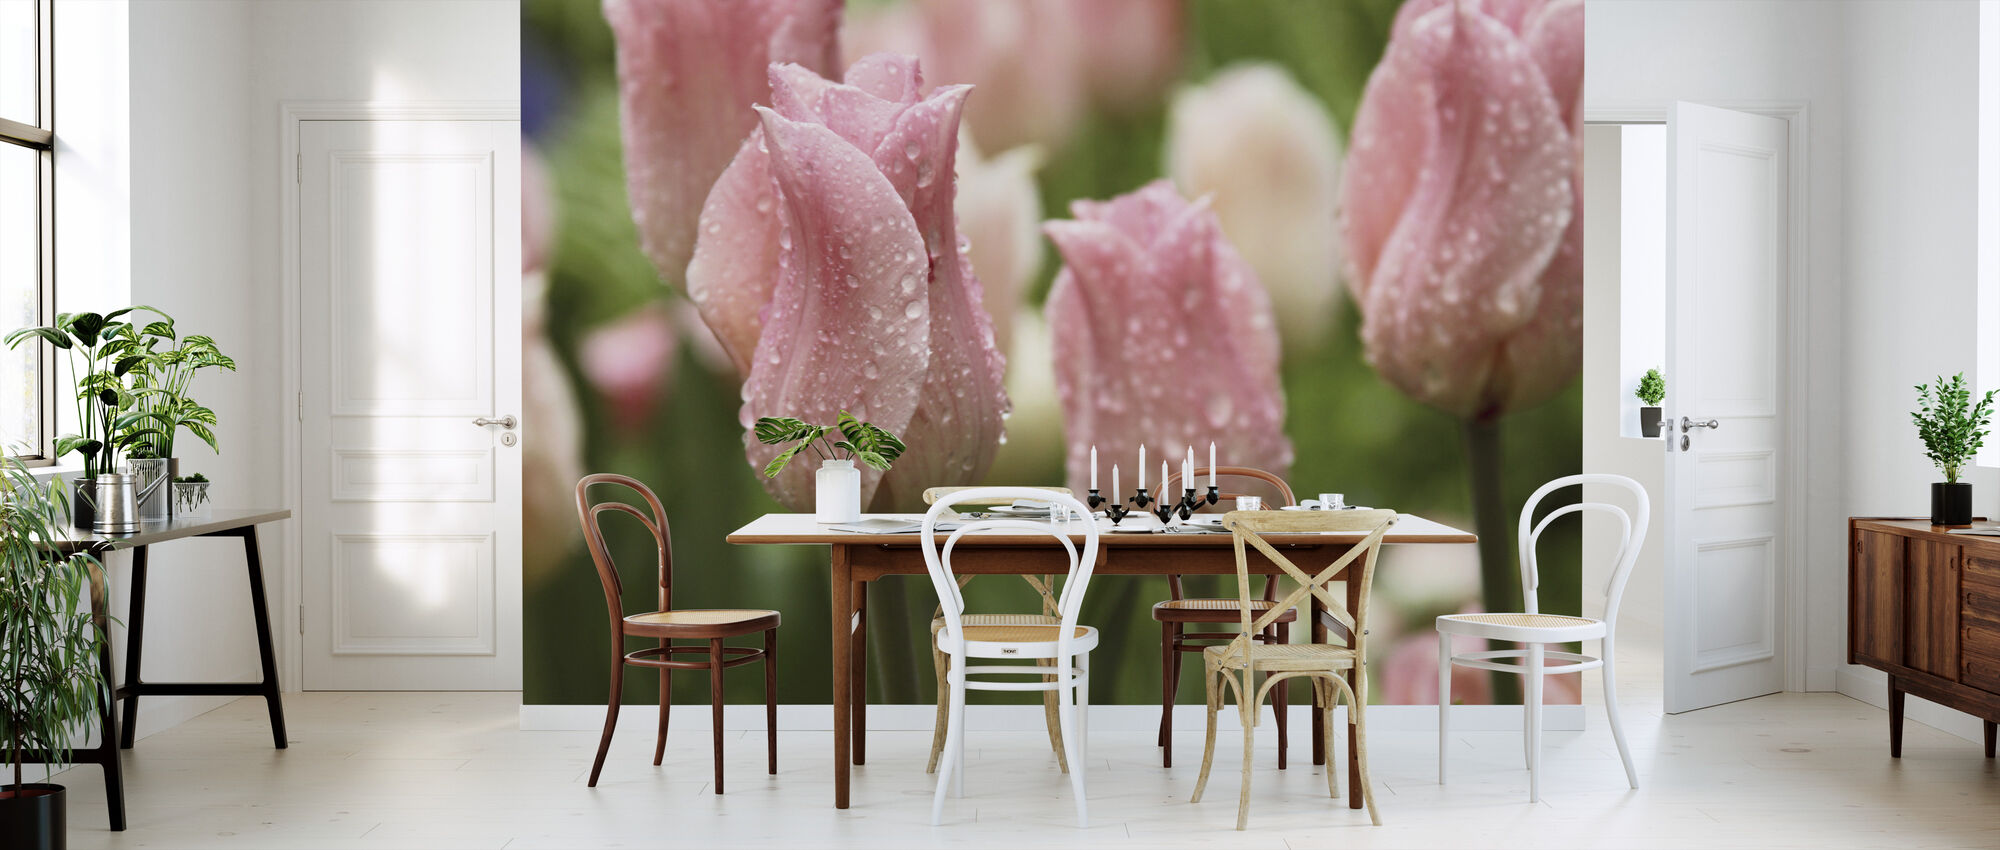 Tulips After Rain - Wallpaper - Kitchen